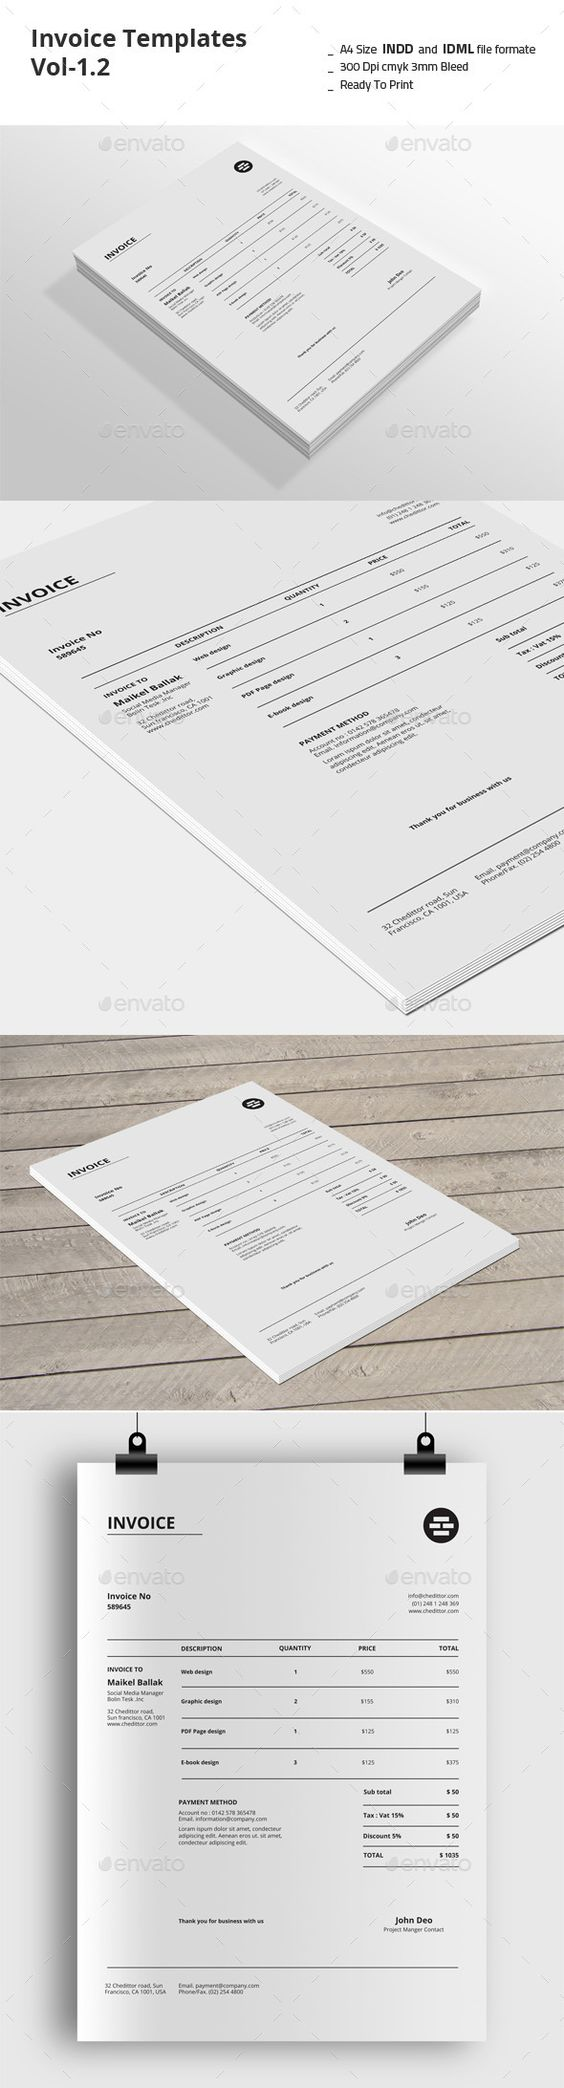 Invoice templates vol 12 invoice template proposals for Https invoice generator com 1